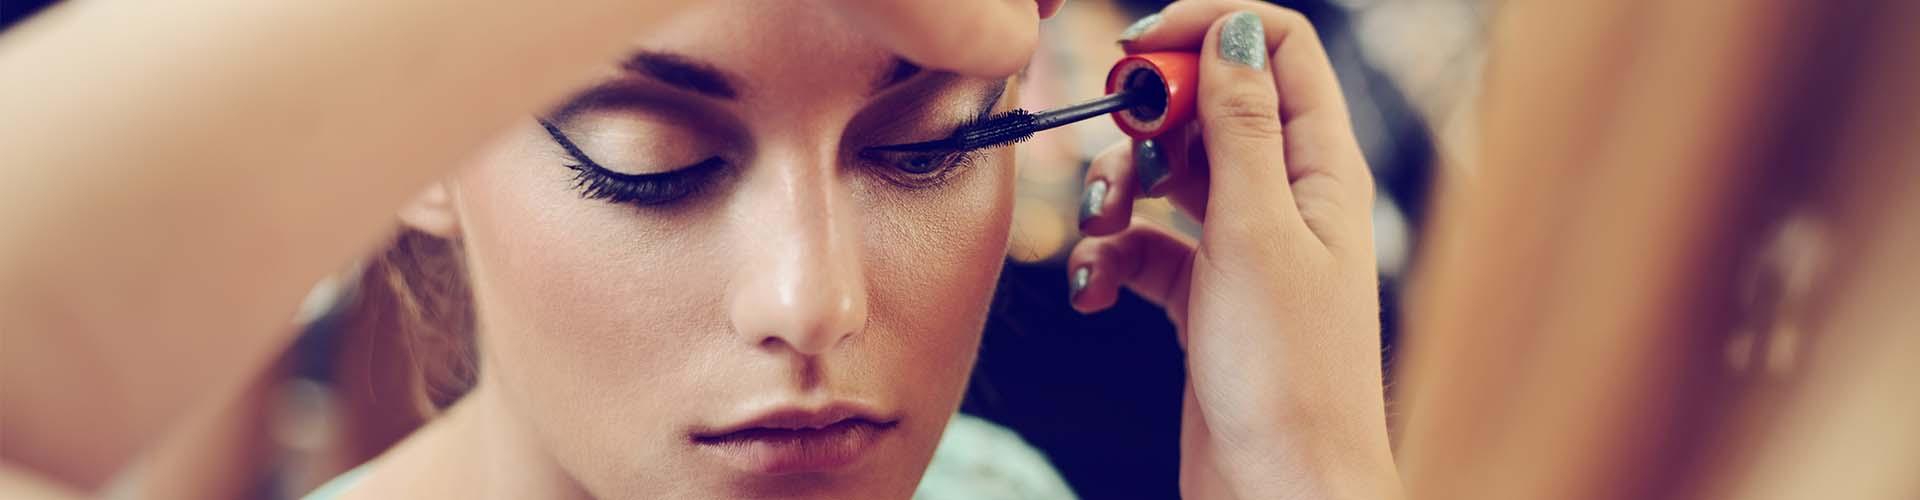 corso makeup artist